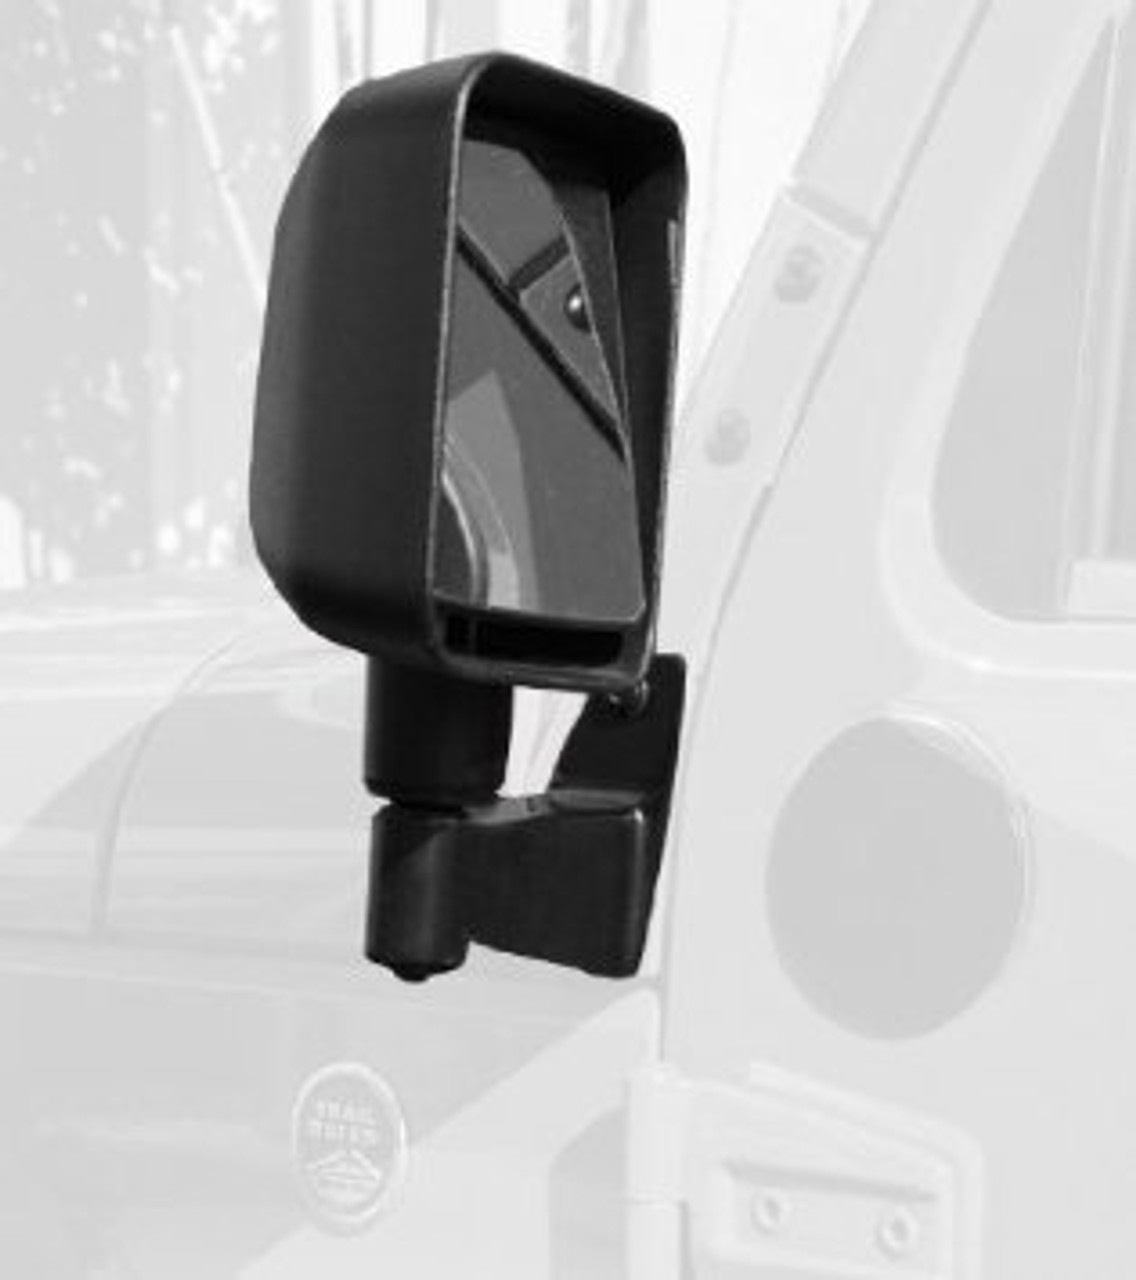 Rugged Ridge 11025.04 Mirror Relocation Bracket Kit in Black for Jeep Wrangler JK 2007-2016